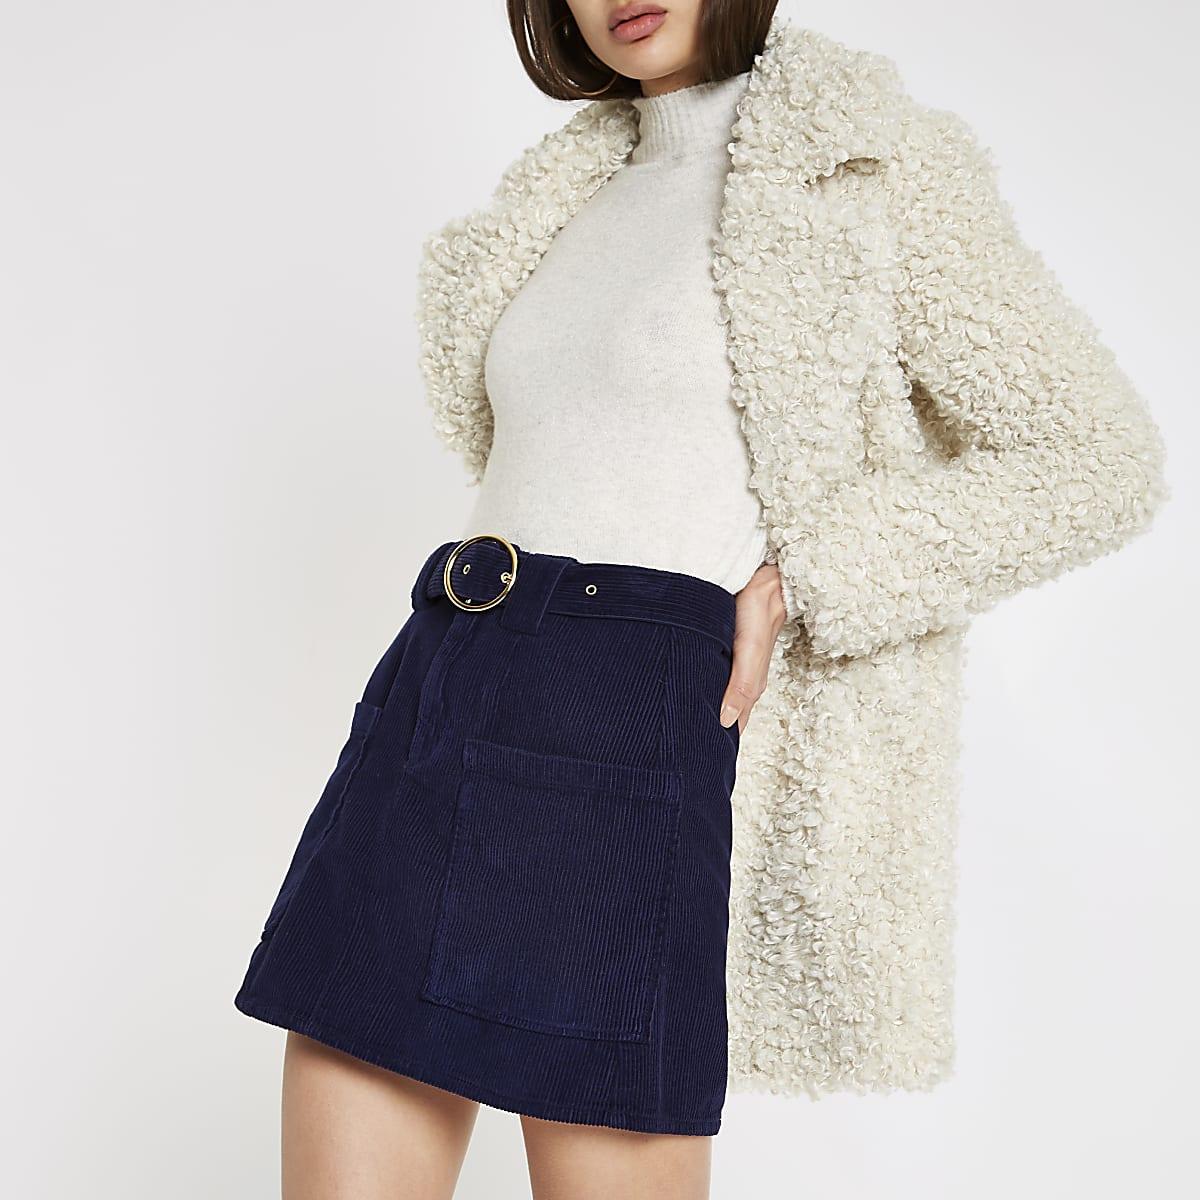 Mini-jupe en velours bleu marine avec ceinture